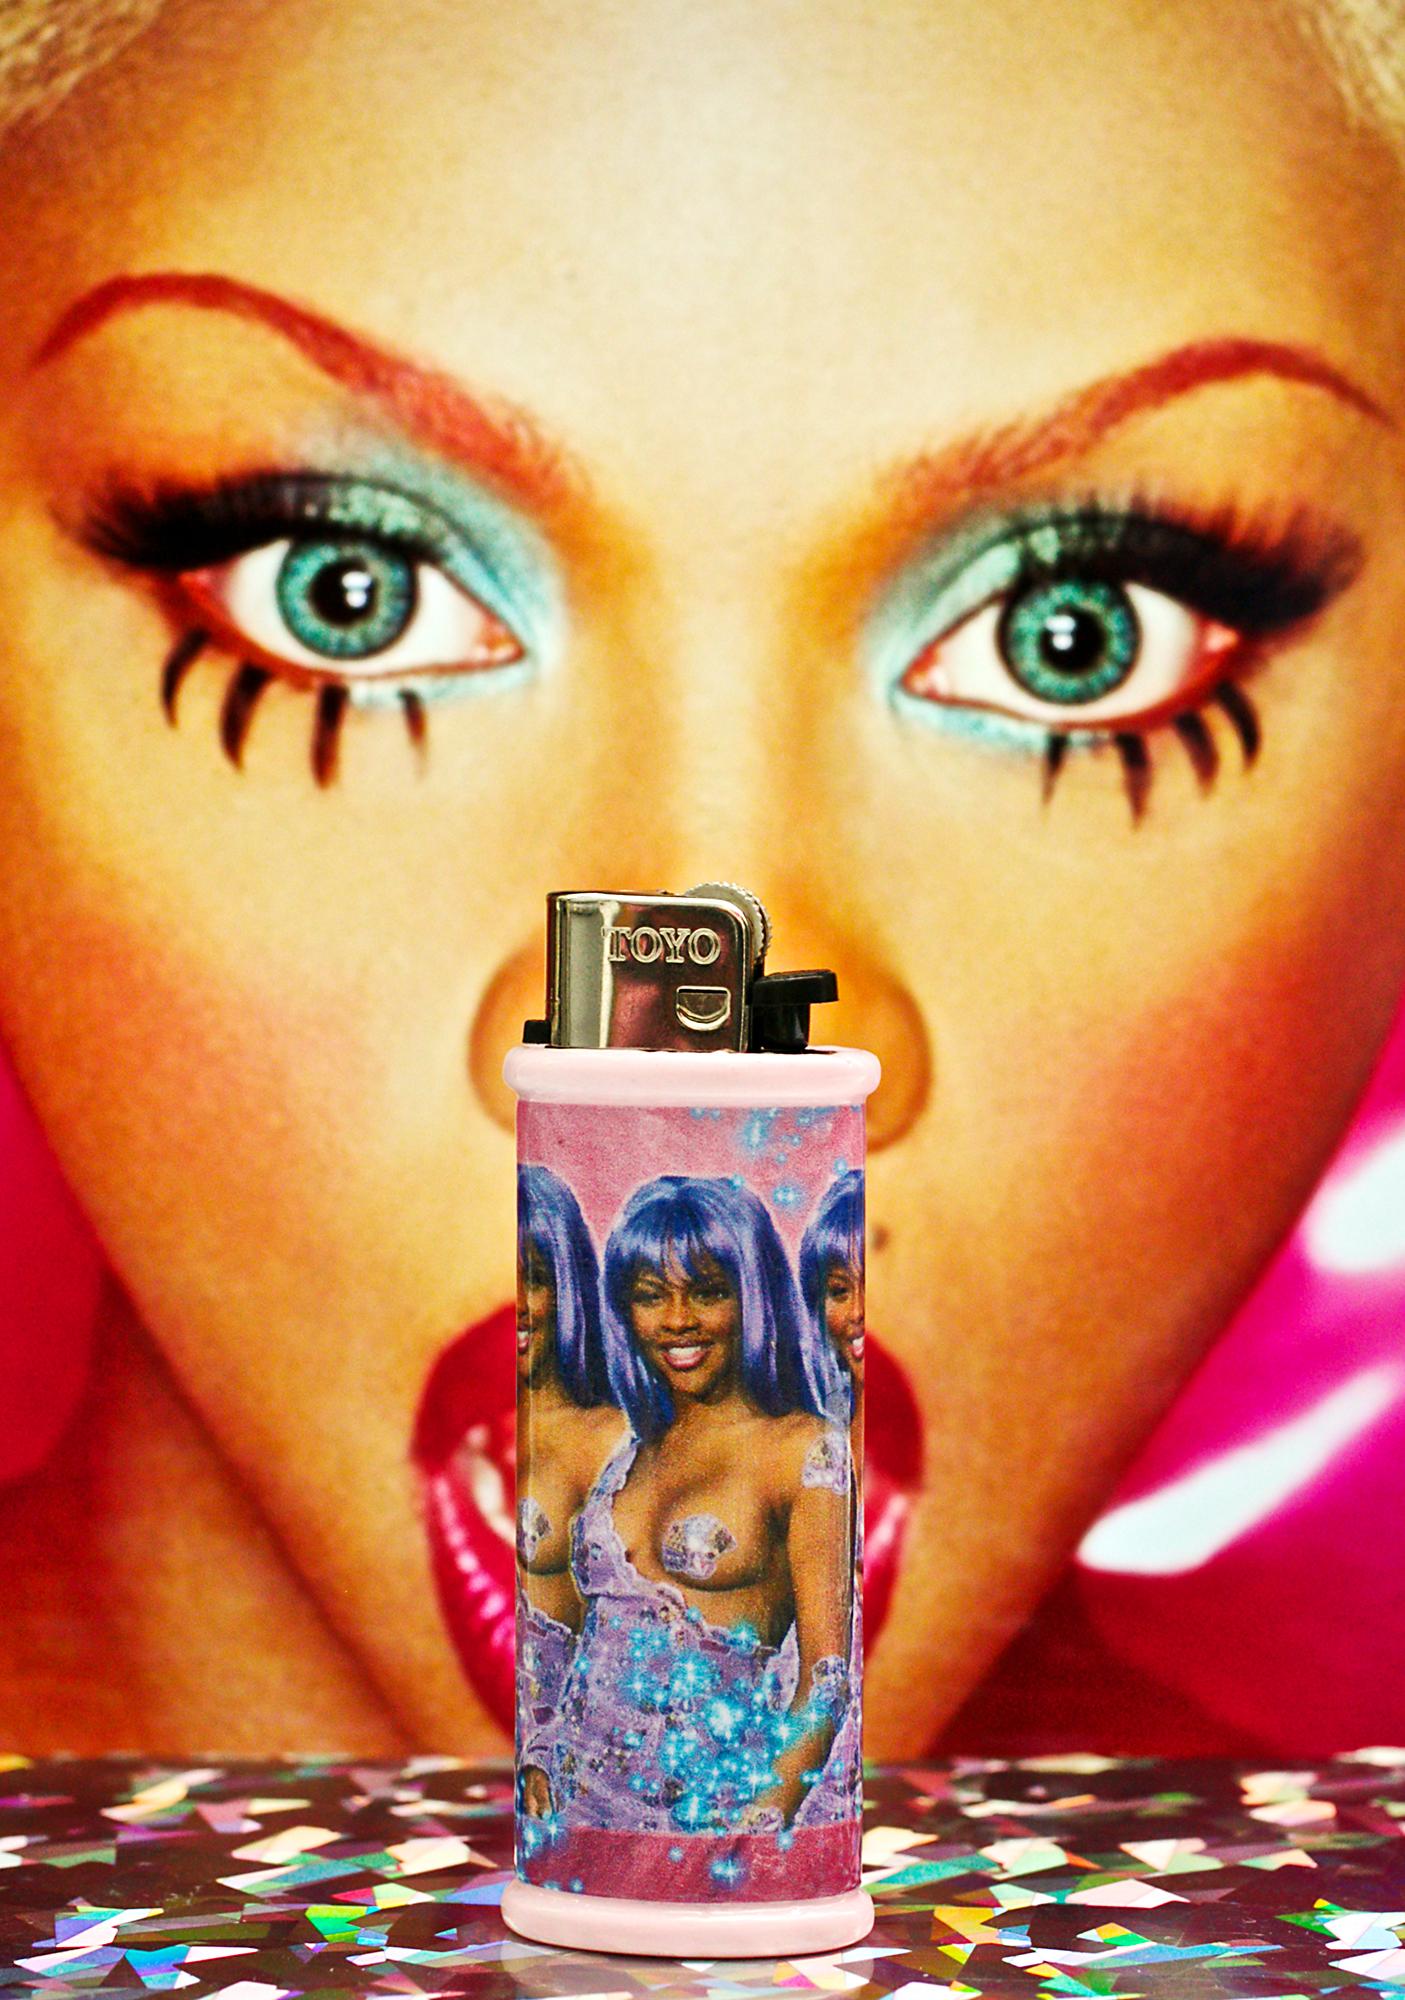 Sicko Cartel Lil Kim Lighter Case